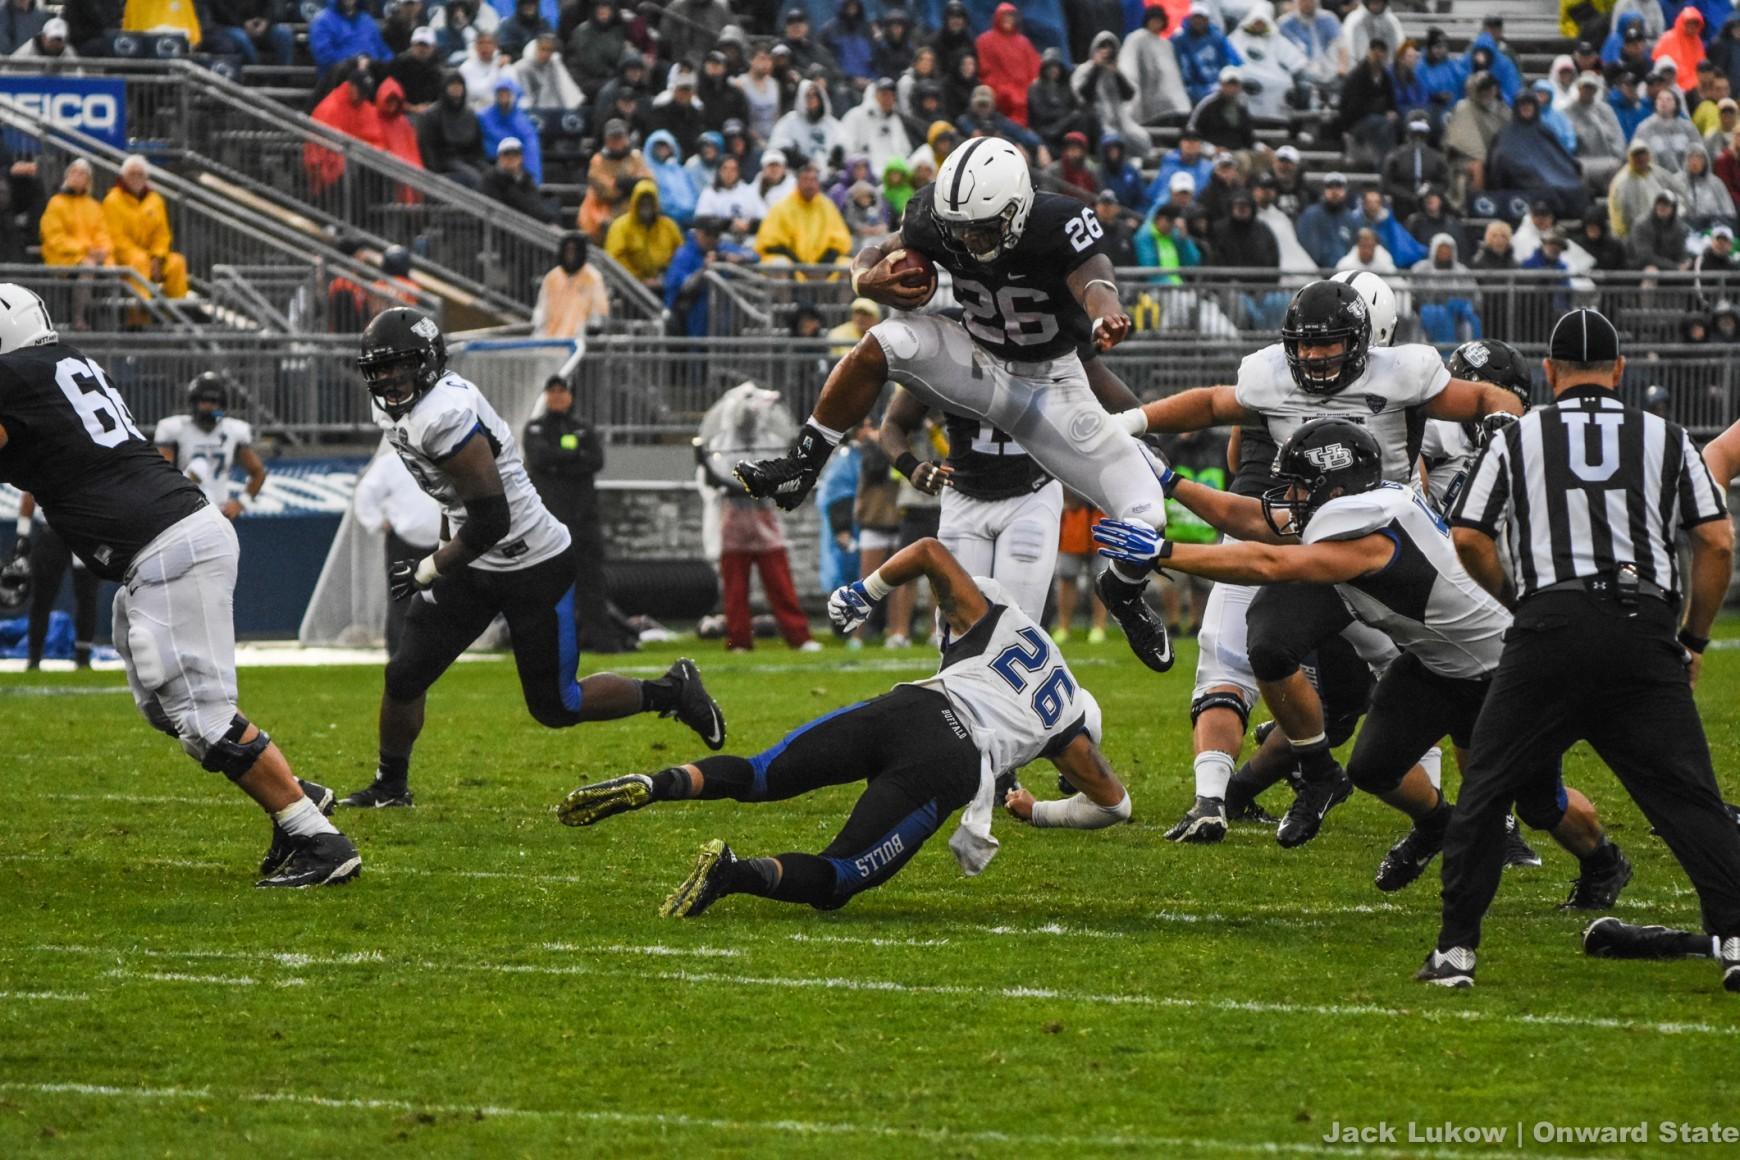 Penn State Vs. Buffalo In Photos | Onward State